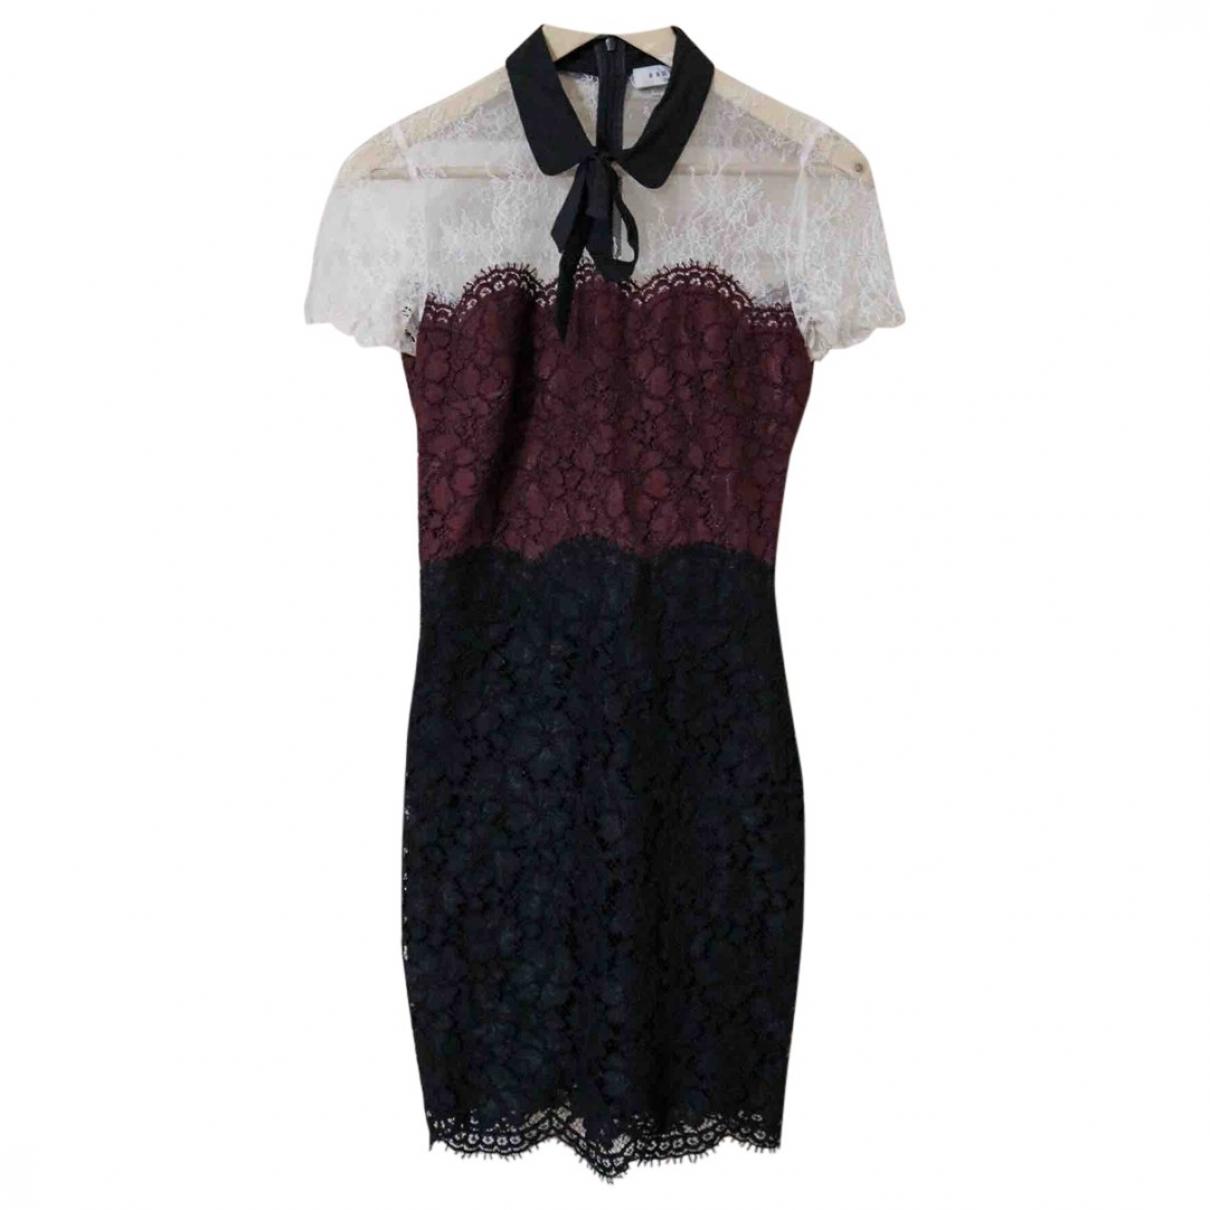 Sandro \N Black Lace dress for Women 1 0-5